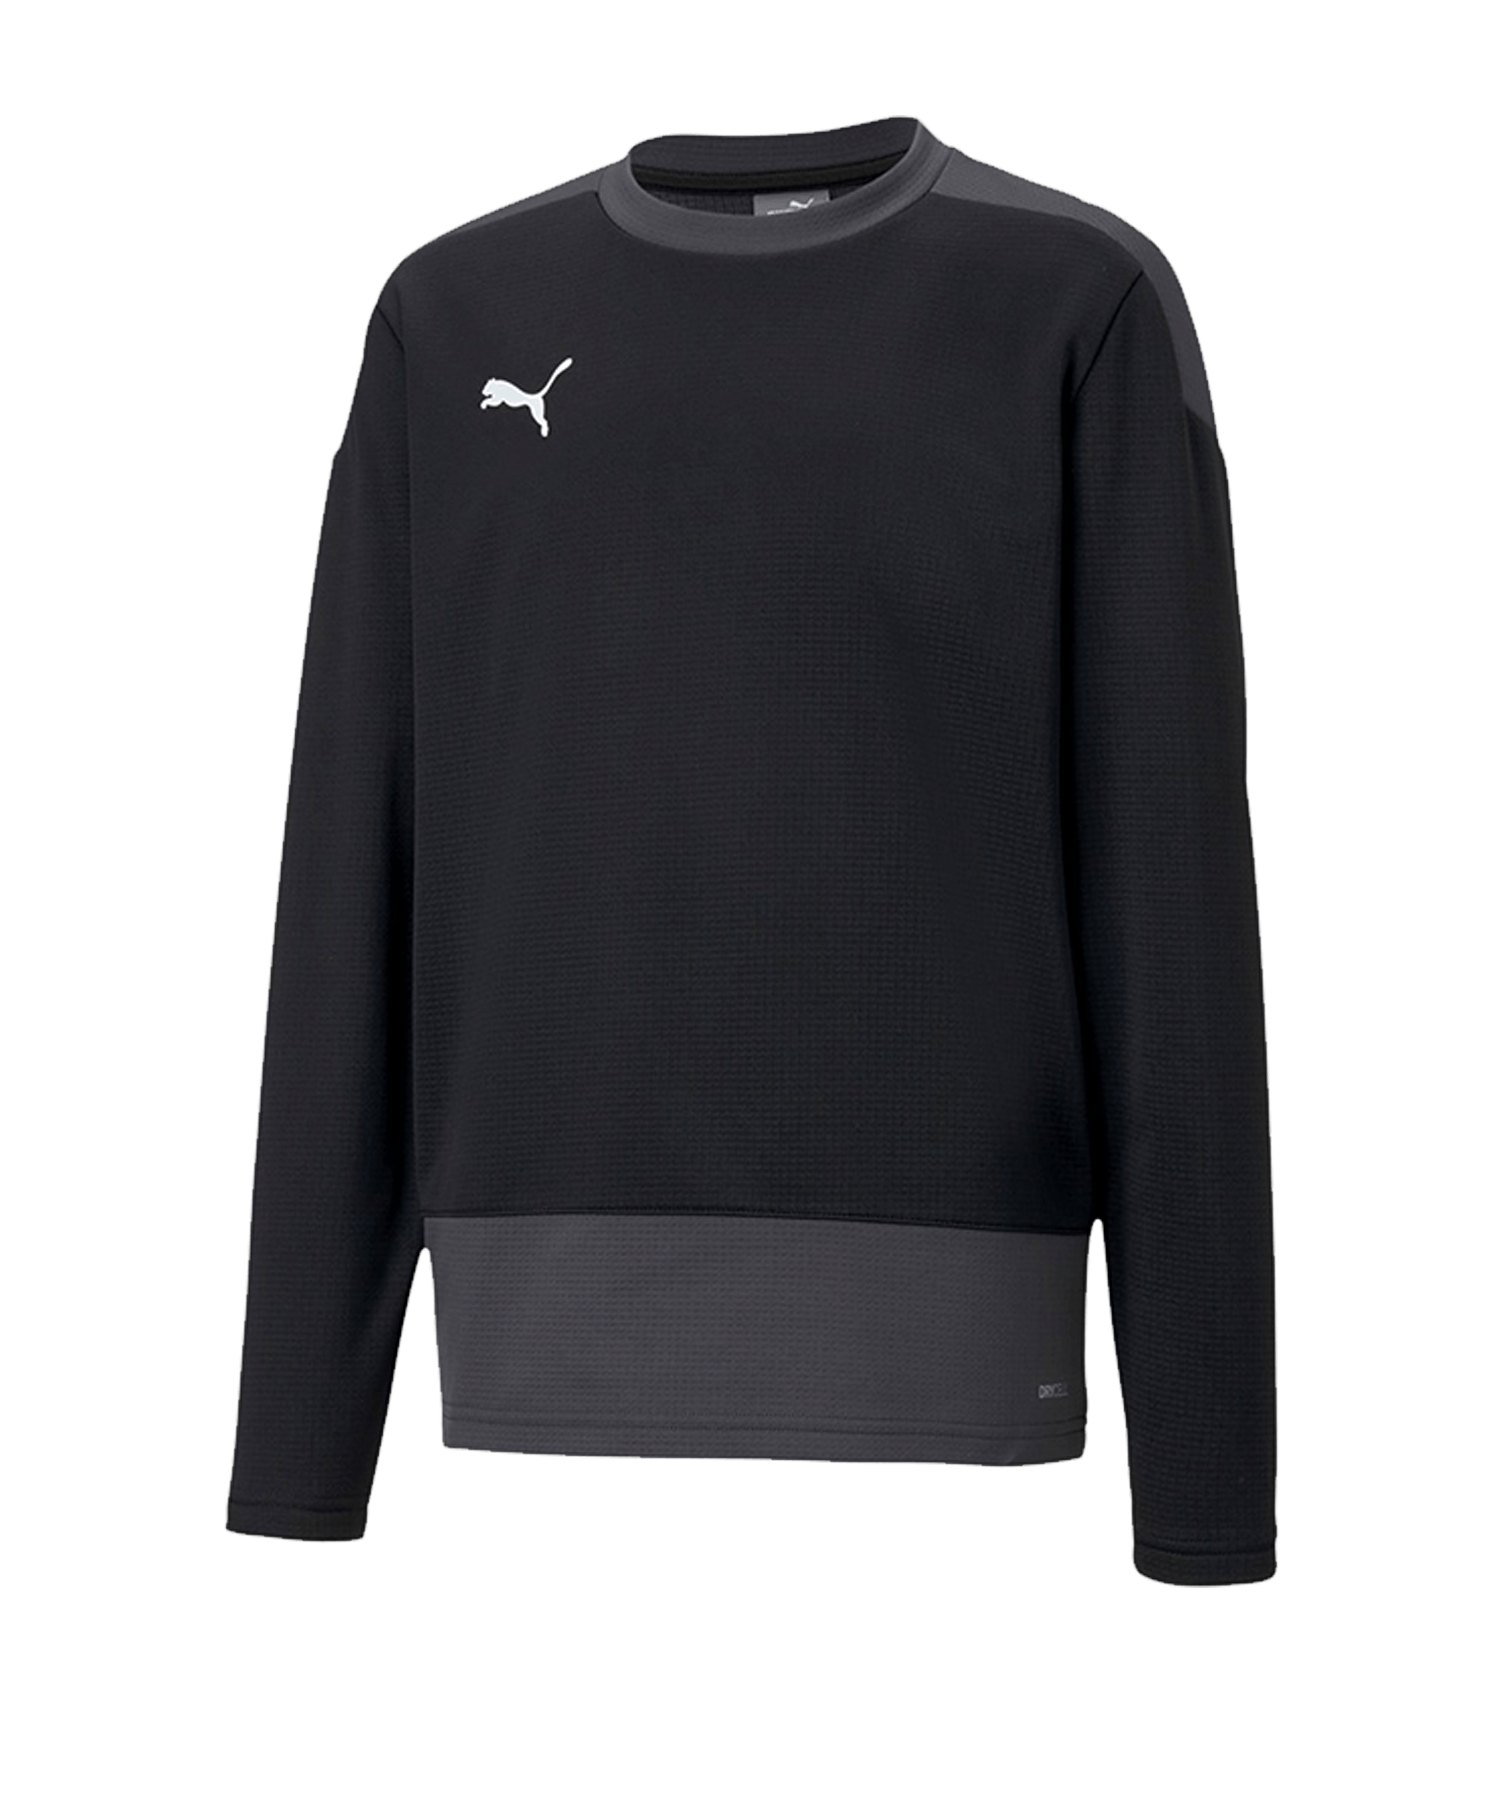 PUMA teamGOAL 23 Training Sweatshirt Kids F03 - schwarz